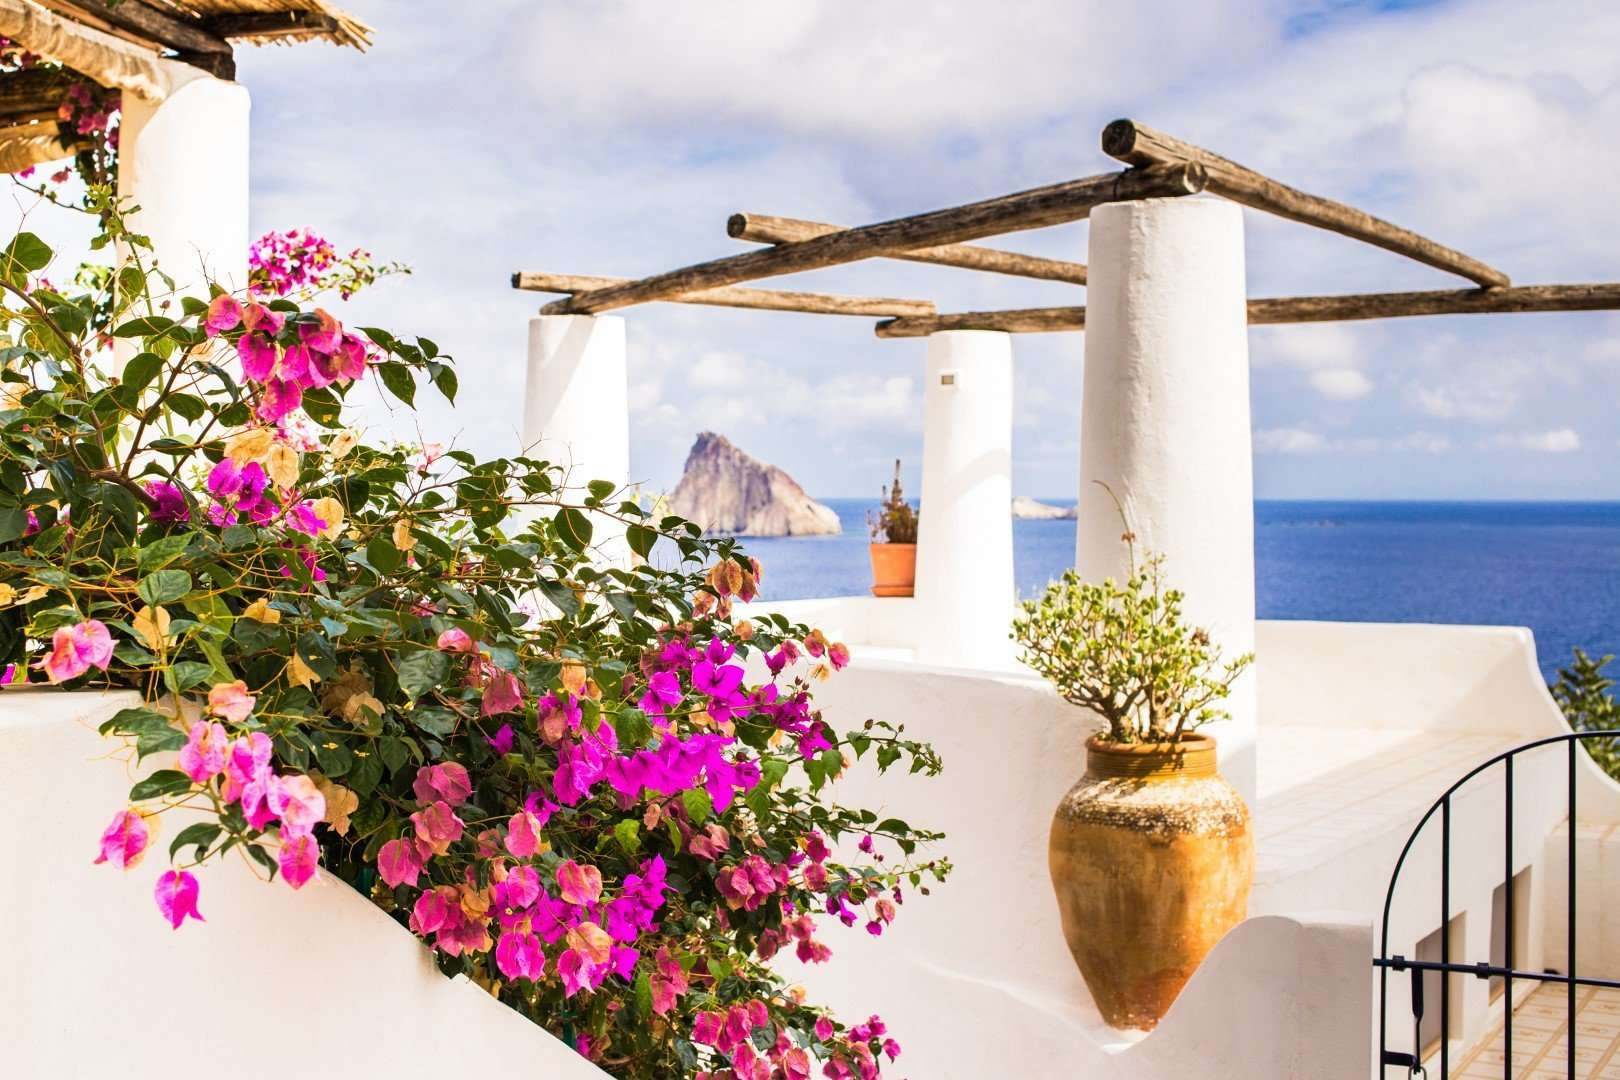 eiland panarea - sicilie